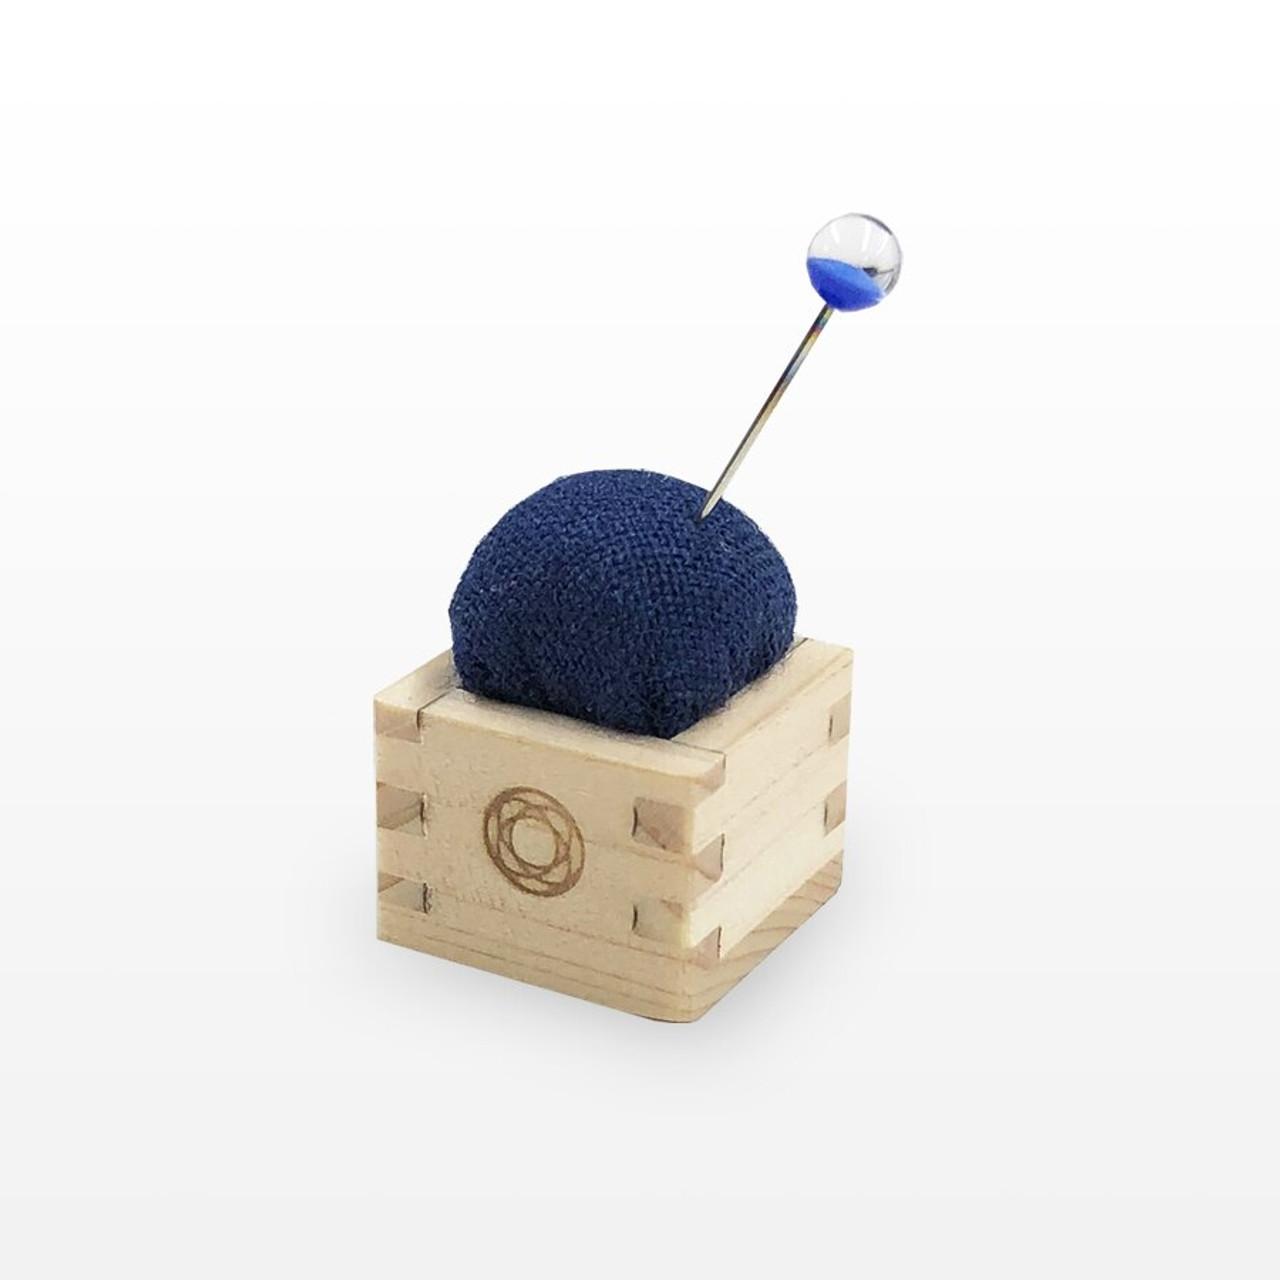 Cohana Pincushion of Mini Masu